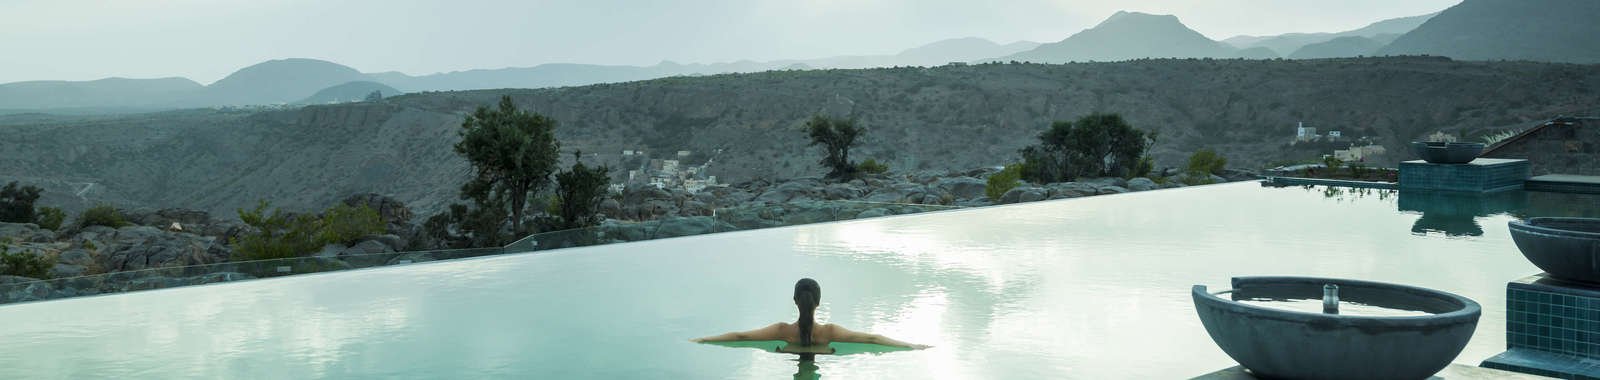 Anantara-Al-Jabal-Al-Akhdar-Resort-Pool-Lifestyle